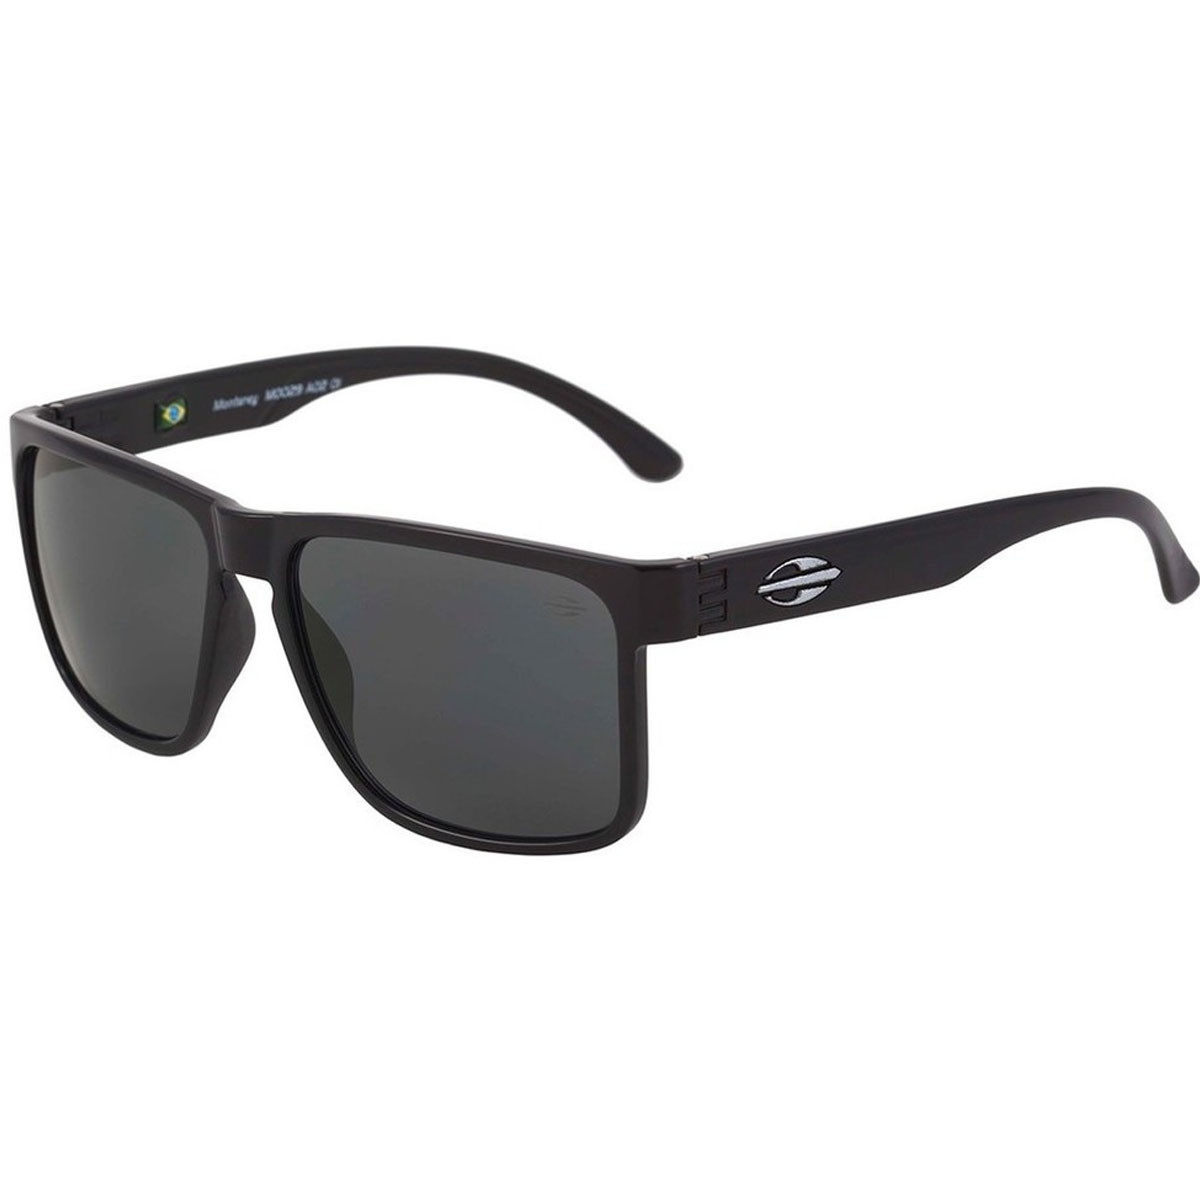 Óculos Mormaii Monterey Preto Fosco  Lente Cinza ref M0029A1401 b9d38bab48